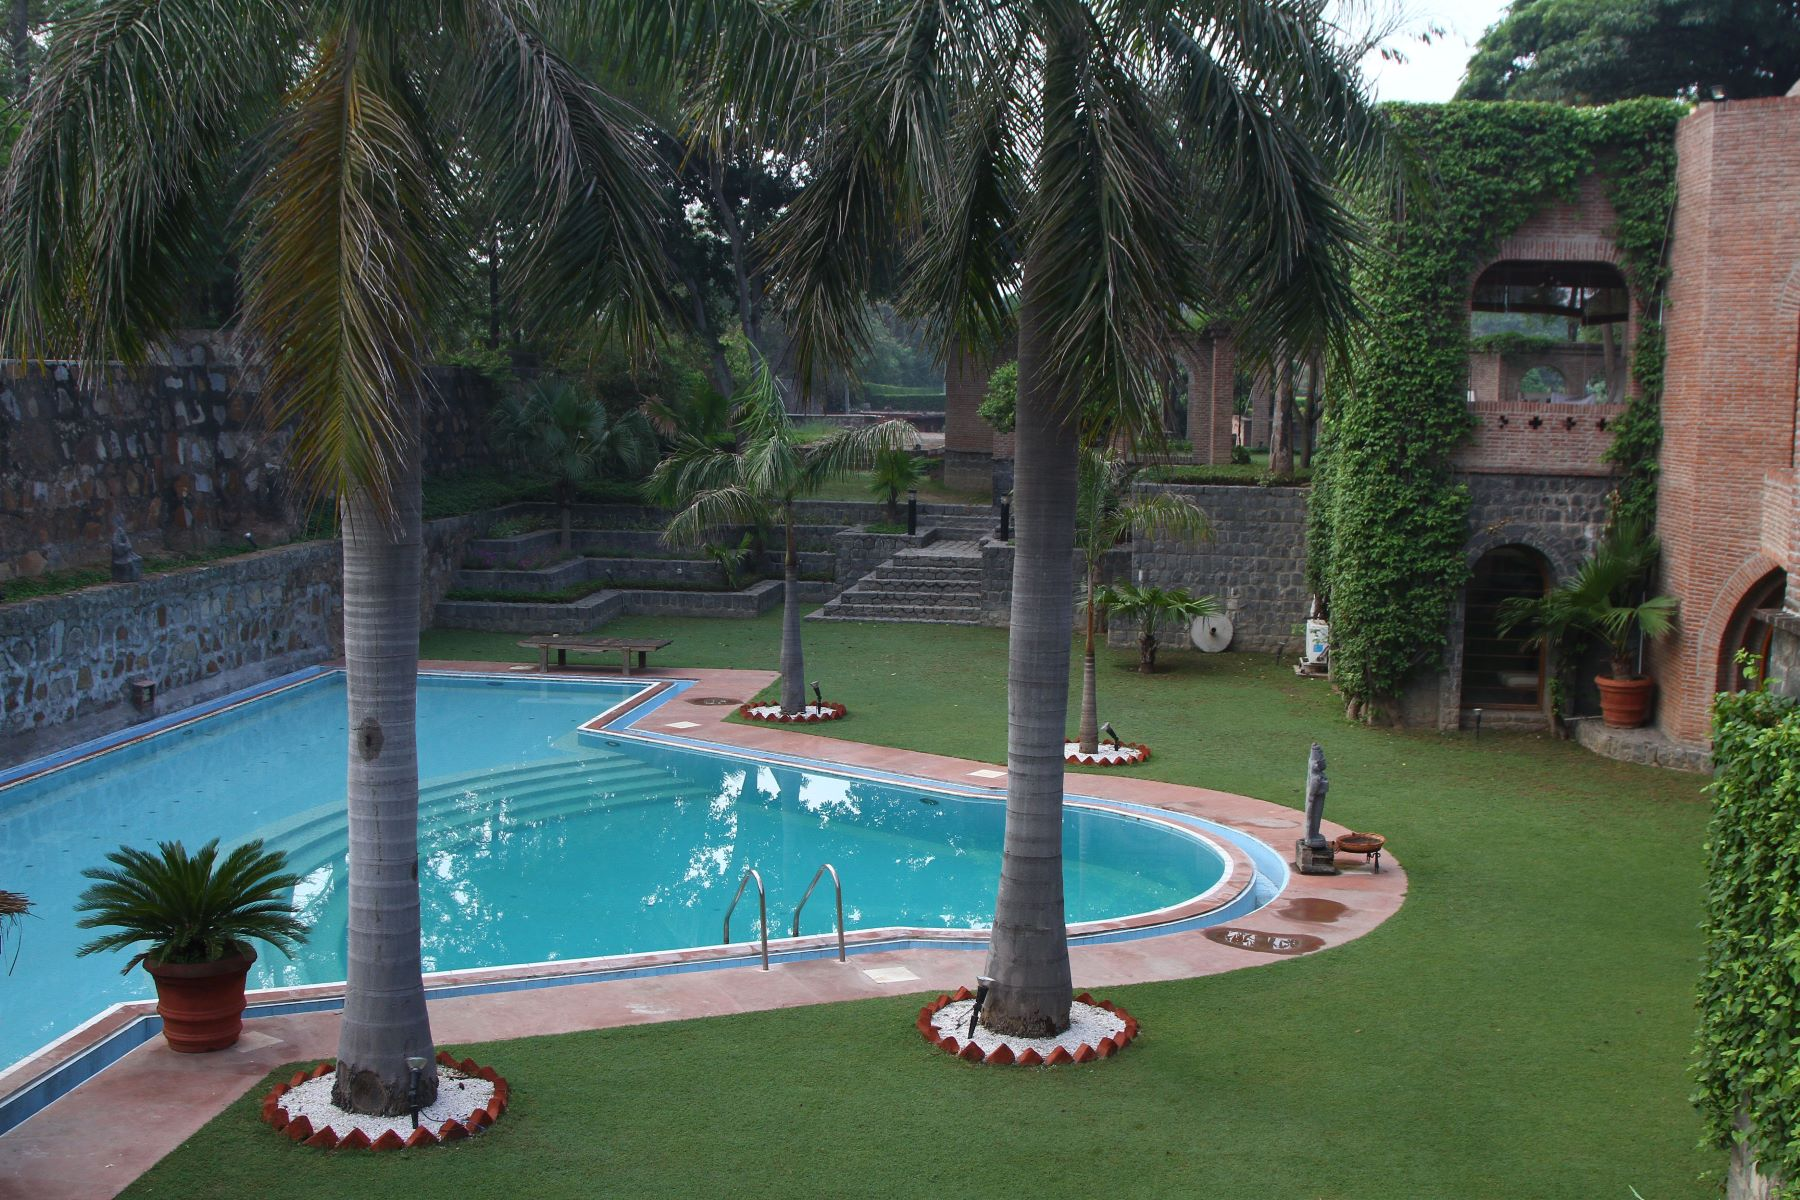 Other Residential for Sale at Exquisite Farmhouse in Chattarpur Dera Mandi New Delhi, Delhi 110074 India